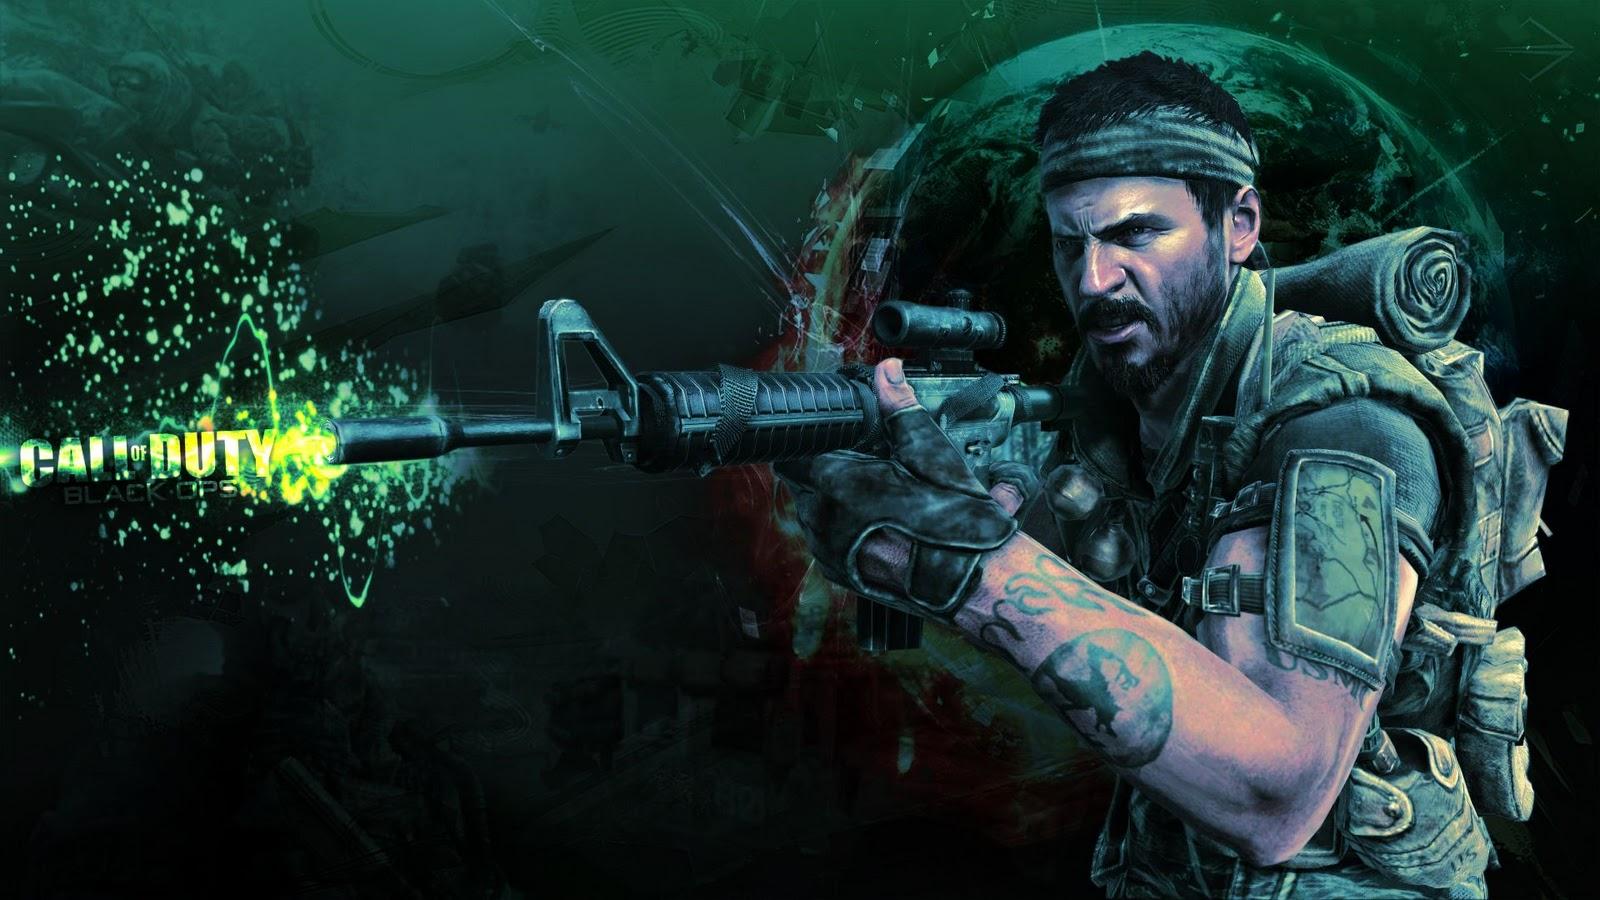 Call of Duty Black Ops HD Wallpapers 1900x1200 Desktop Wallpapers 1600x900